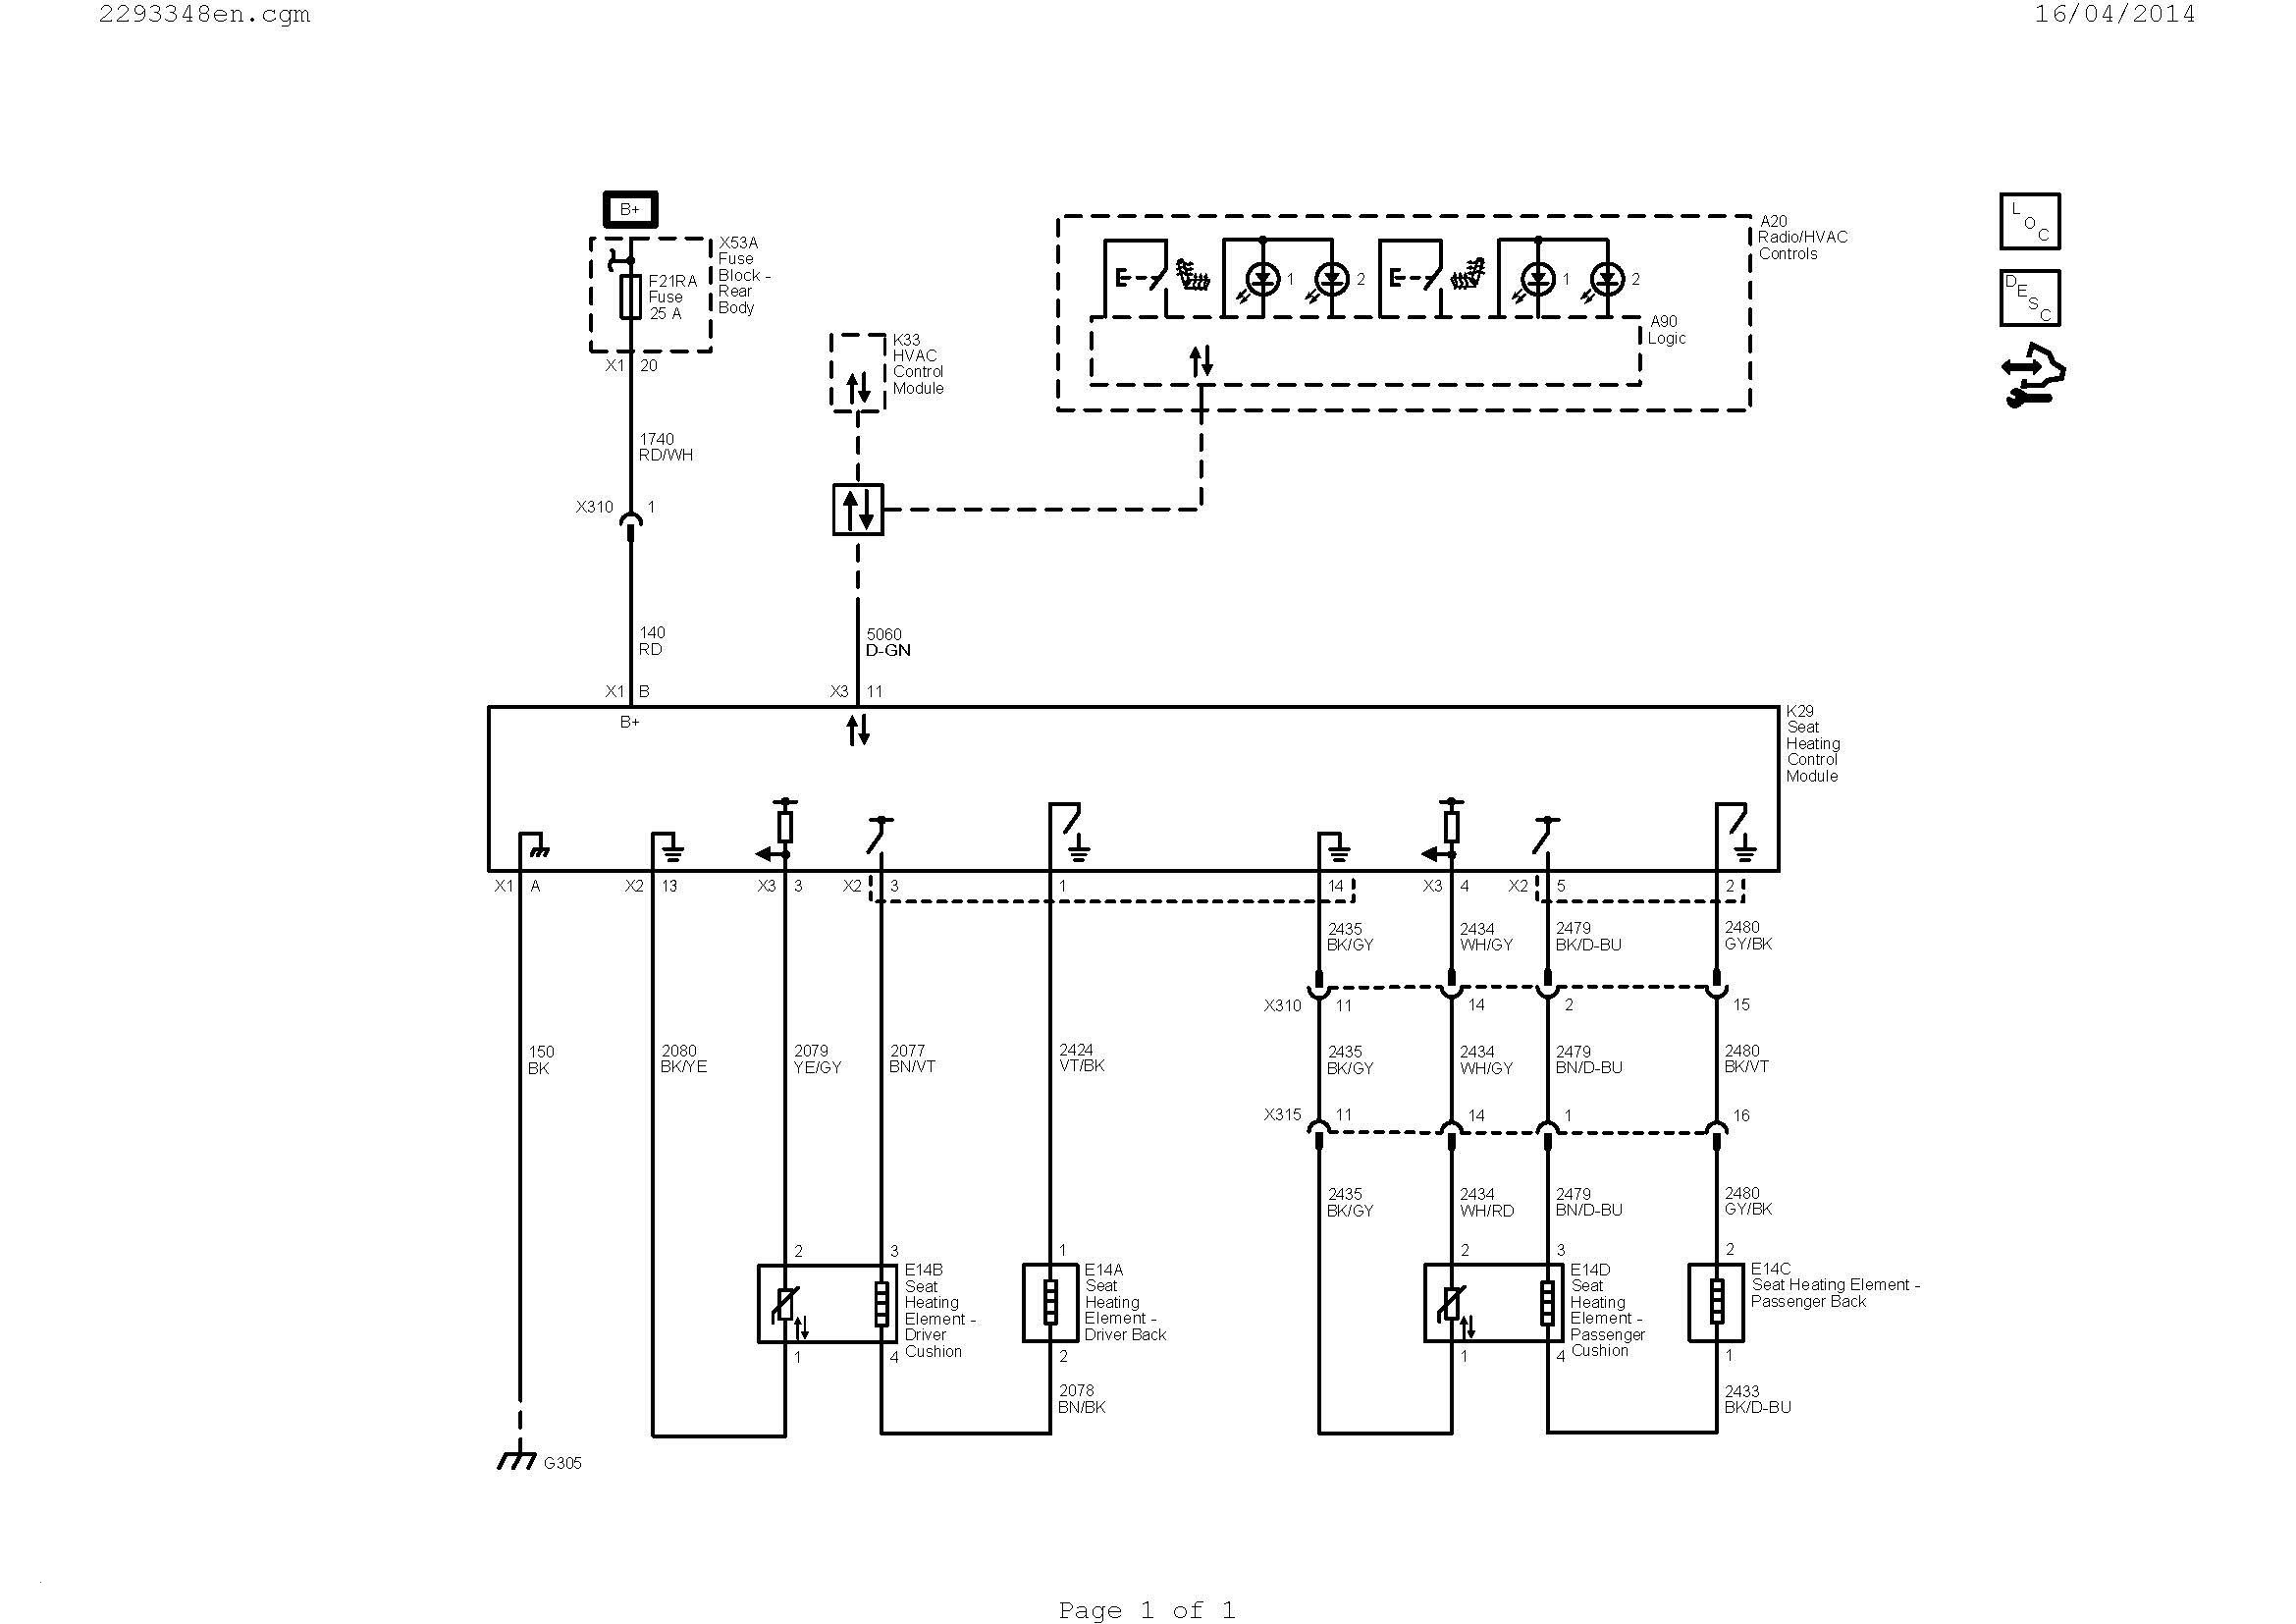 Auto Engine Diagram Automotive Wiring Diagrams Schaferforcongressfo Of Auto Engine Diagram